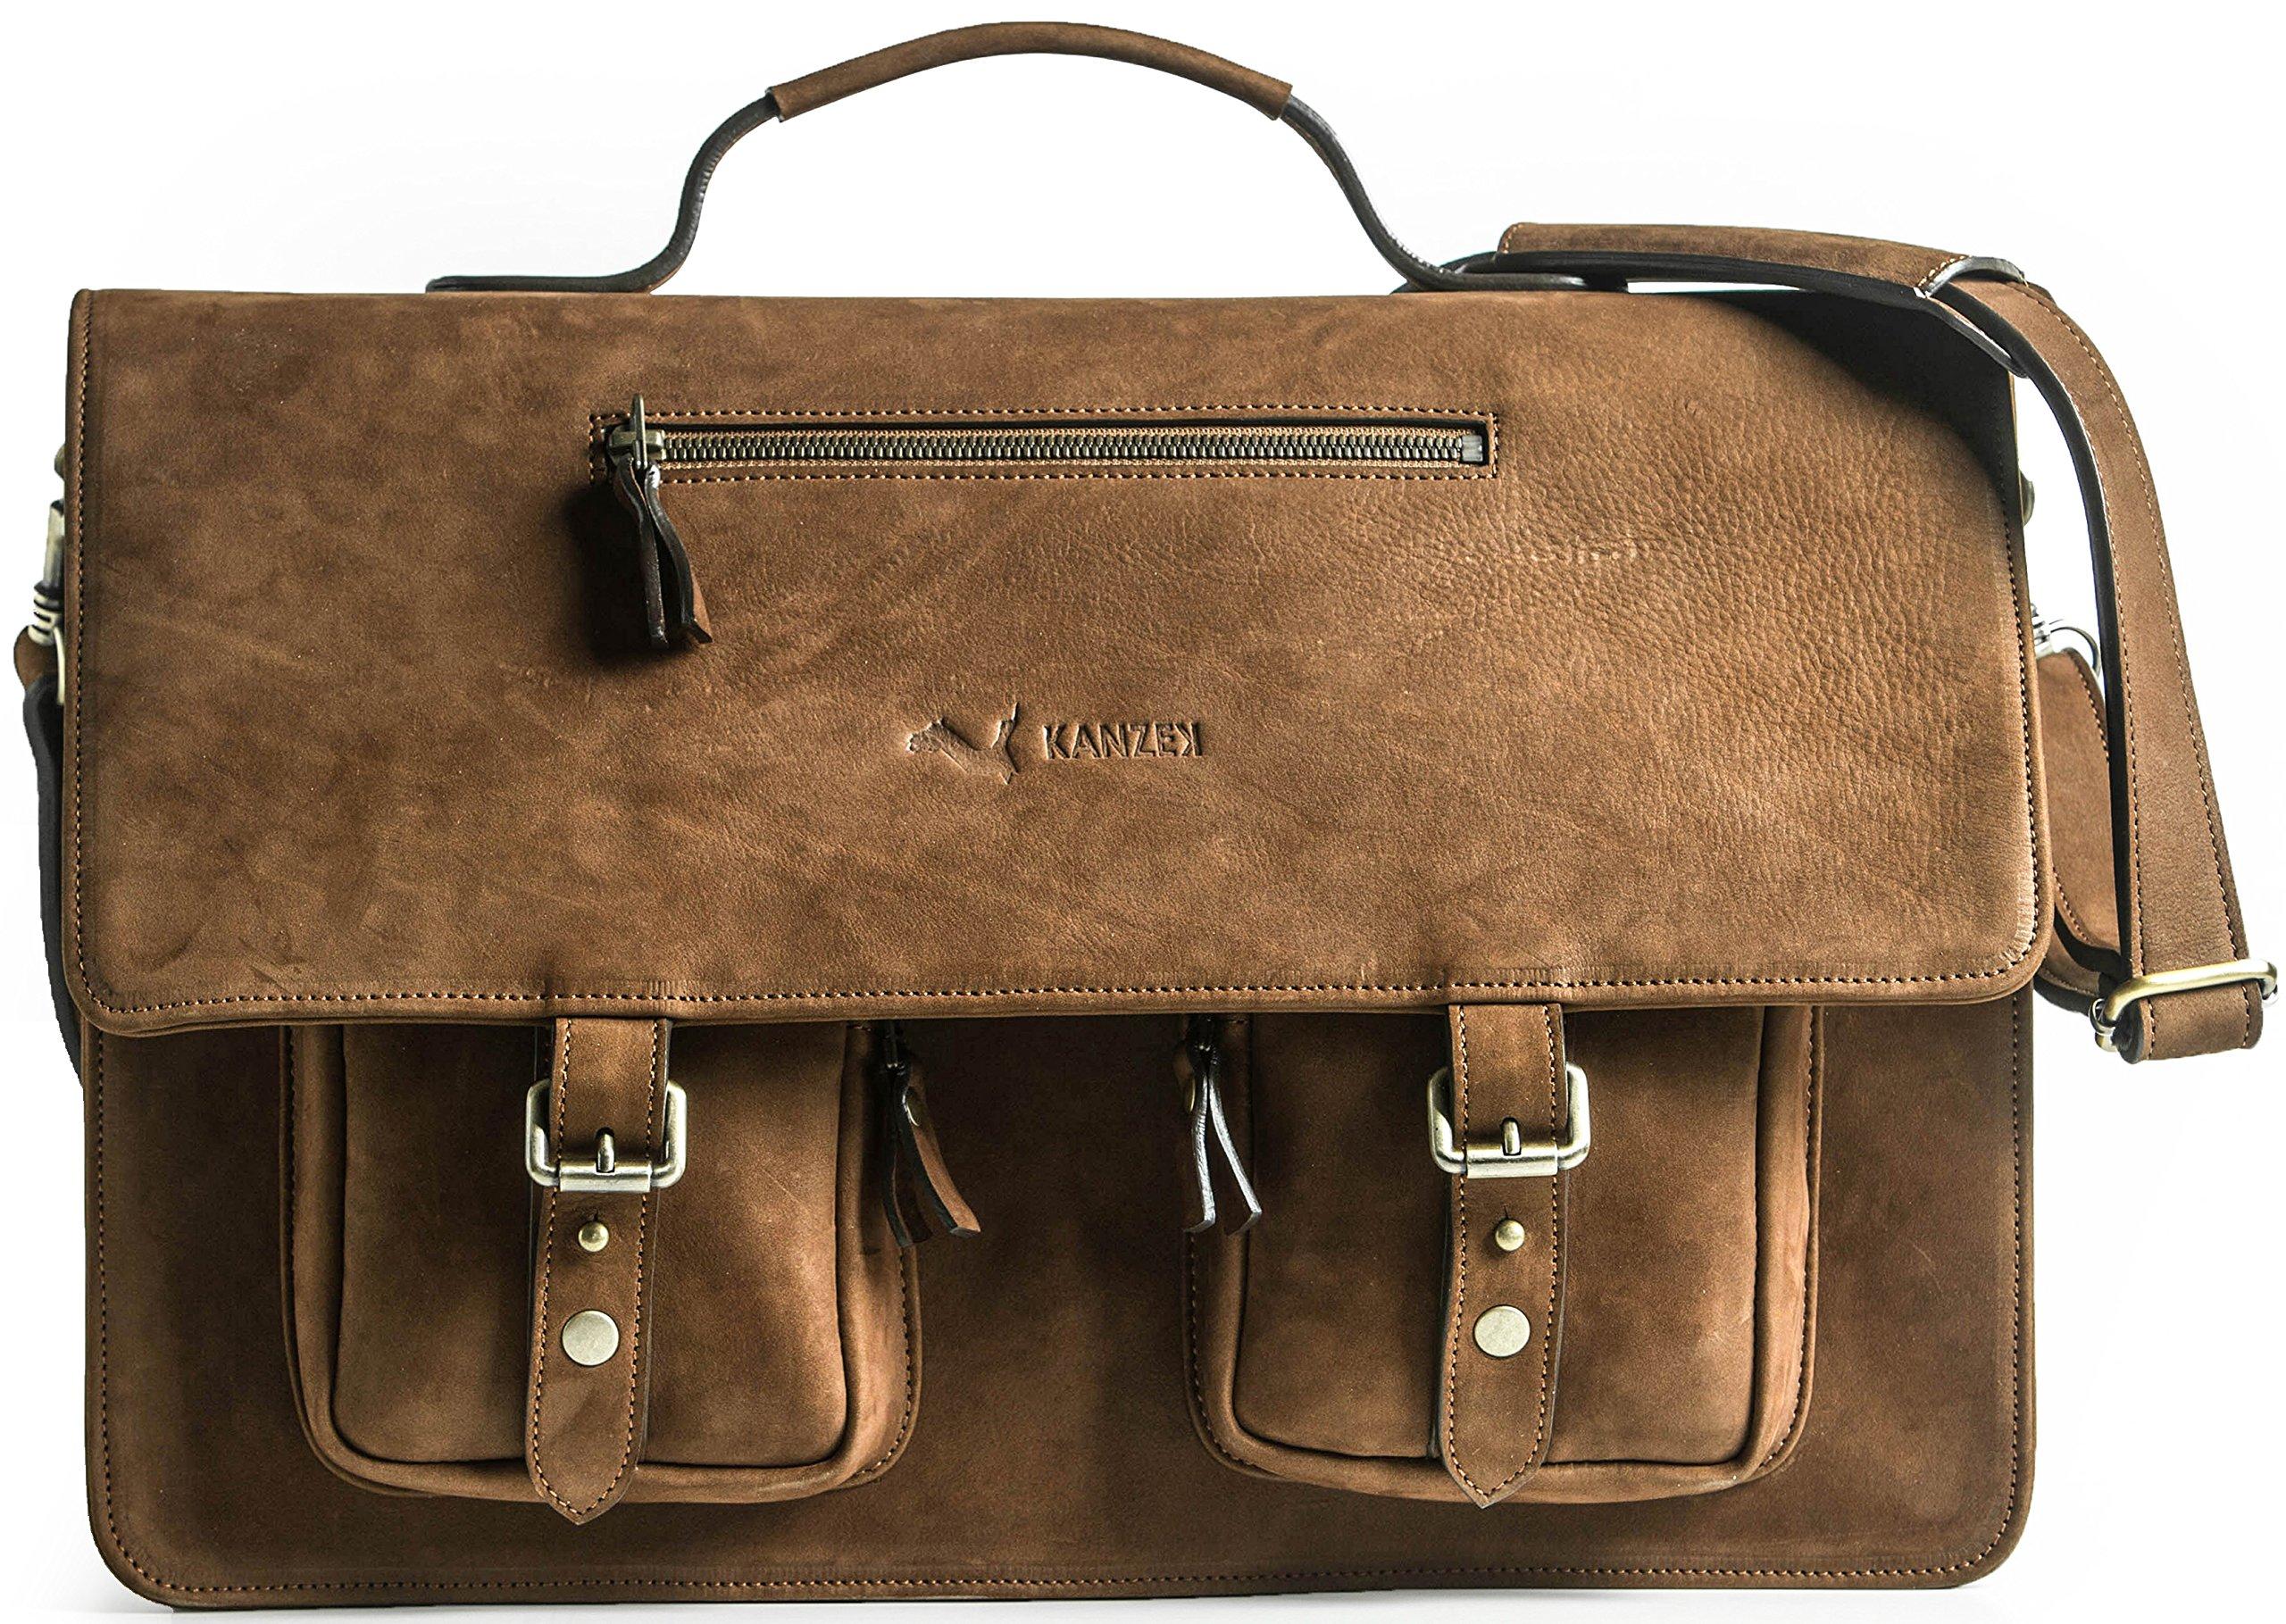 KANZEK Brown Luxury Full Grain Cowhide Leather Messenger Bag / Executive Shoulder Satchel Briefcase, 17 inch Laptops. Distressed Vintage, Large and Light for Business Professionals - Men's & Women's by KANZEK